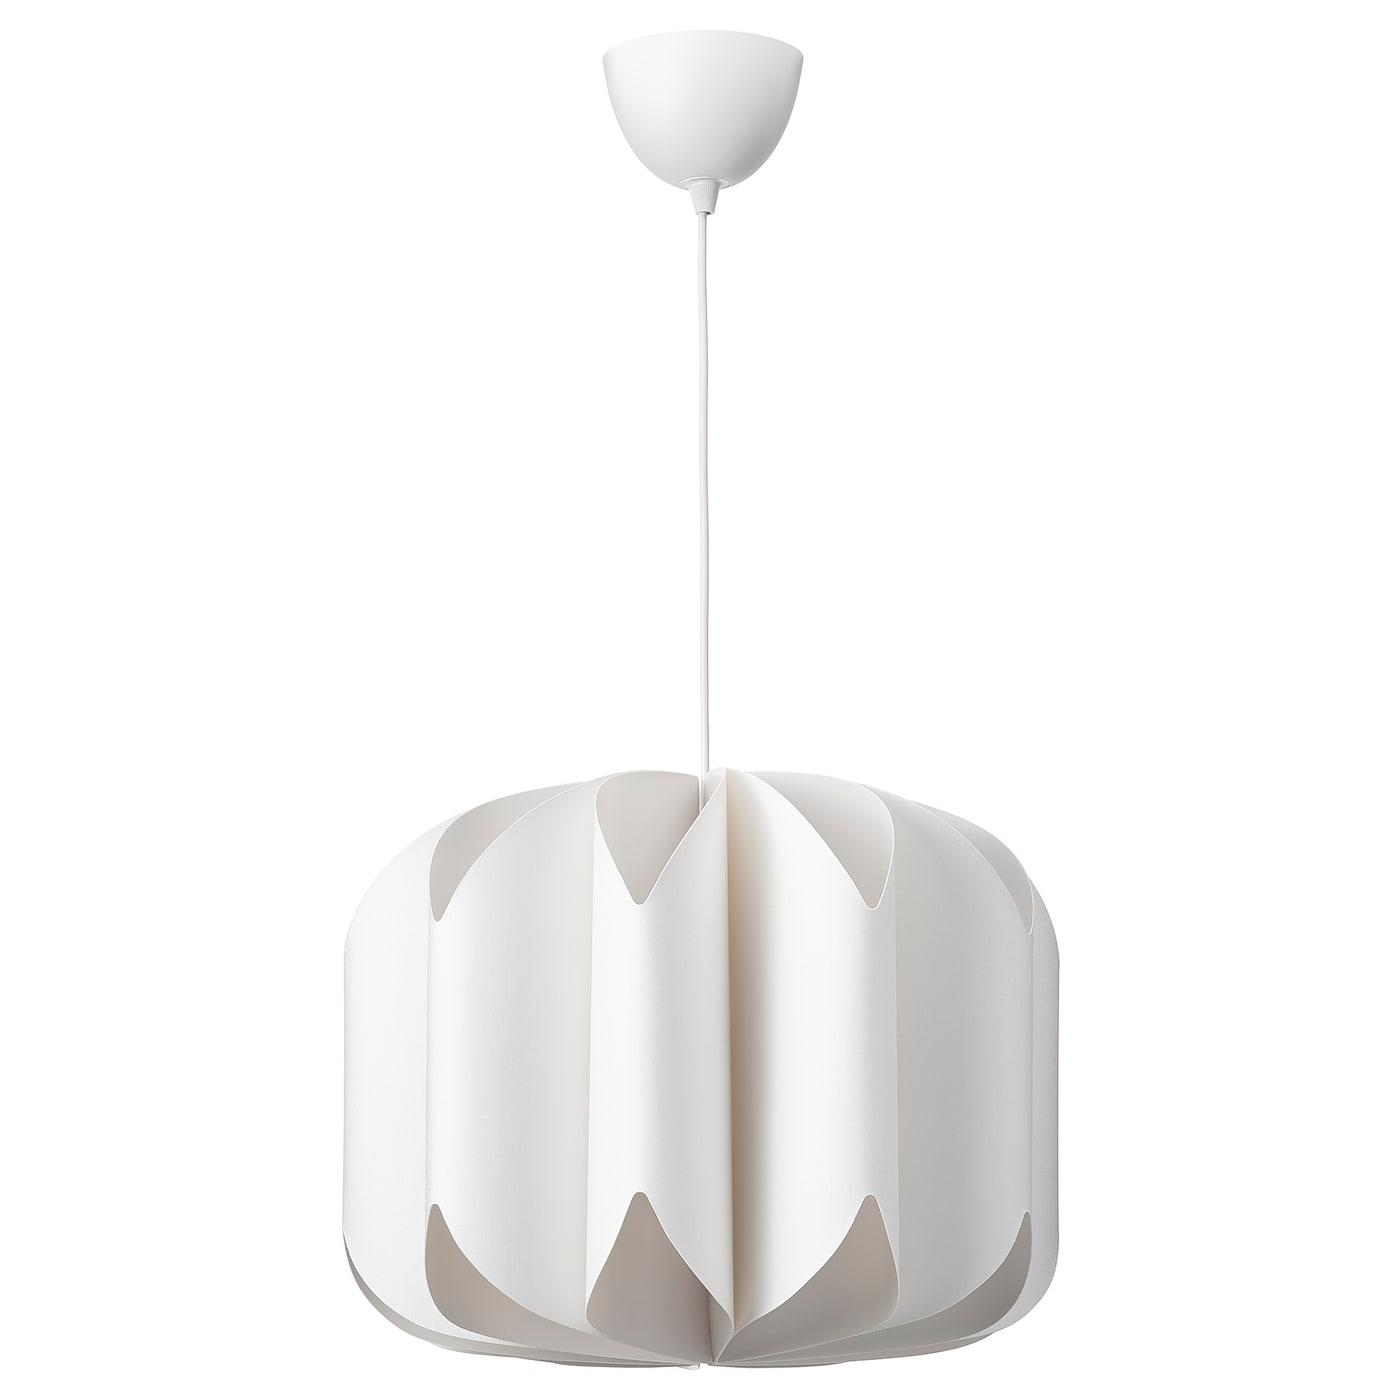 MOJNA / HEMMA Hanglamp, wit